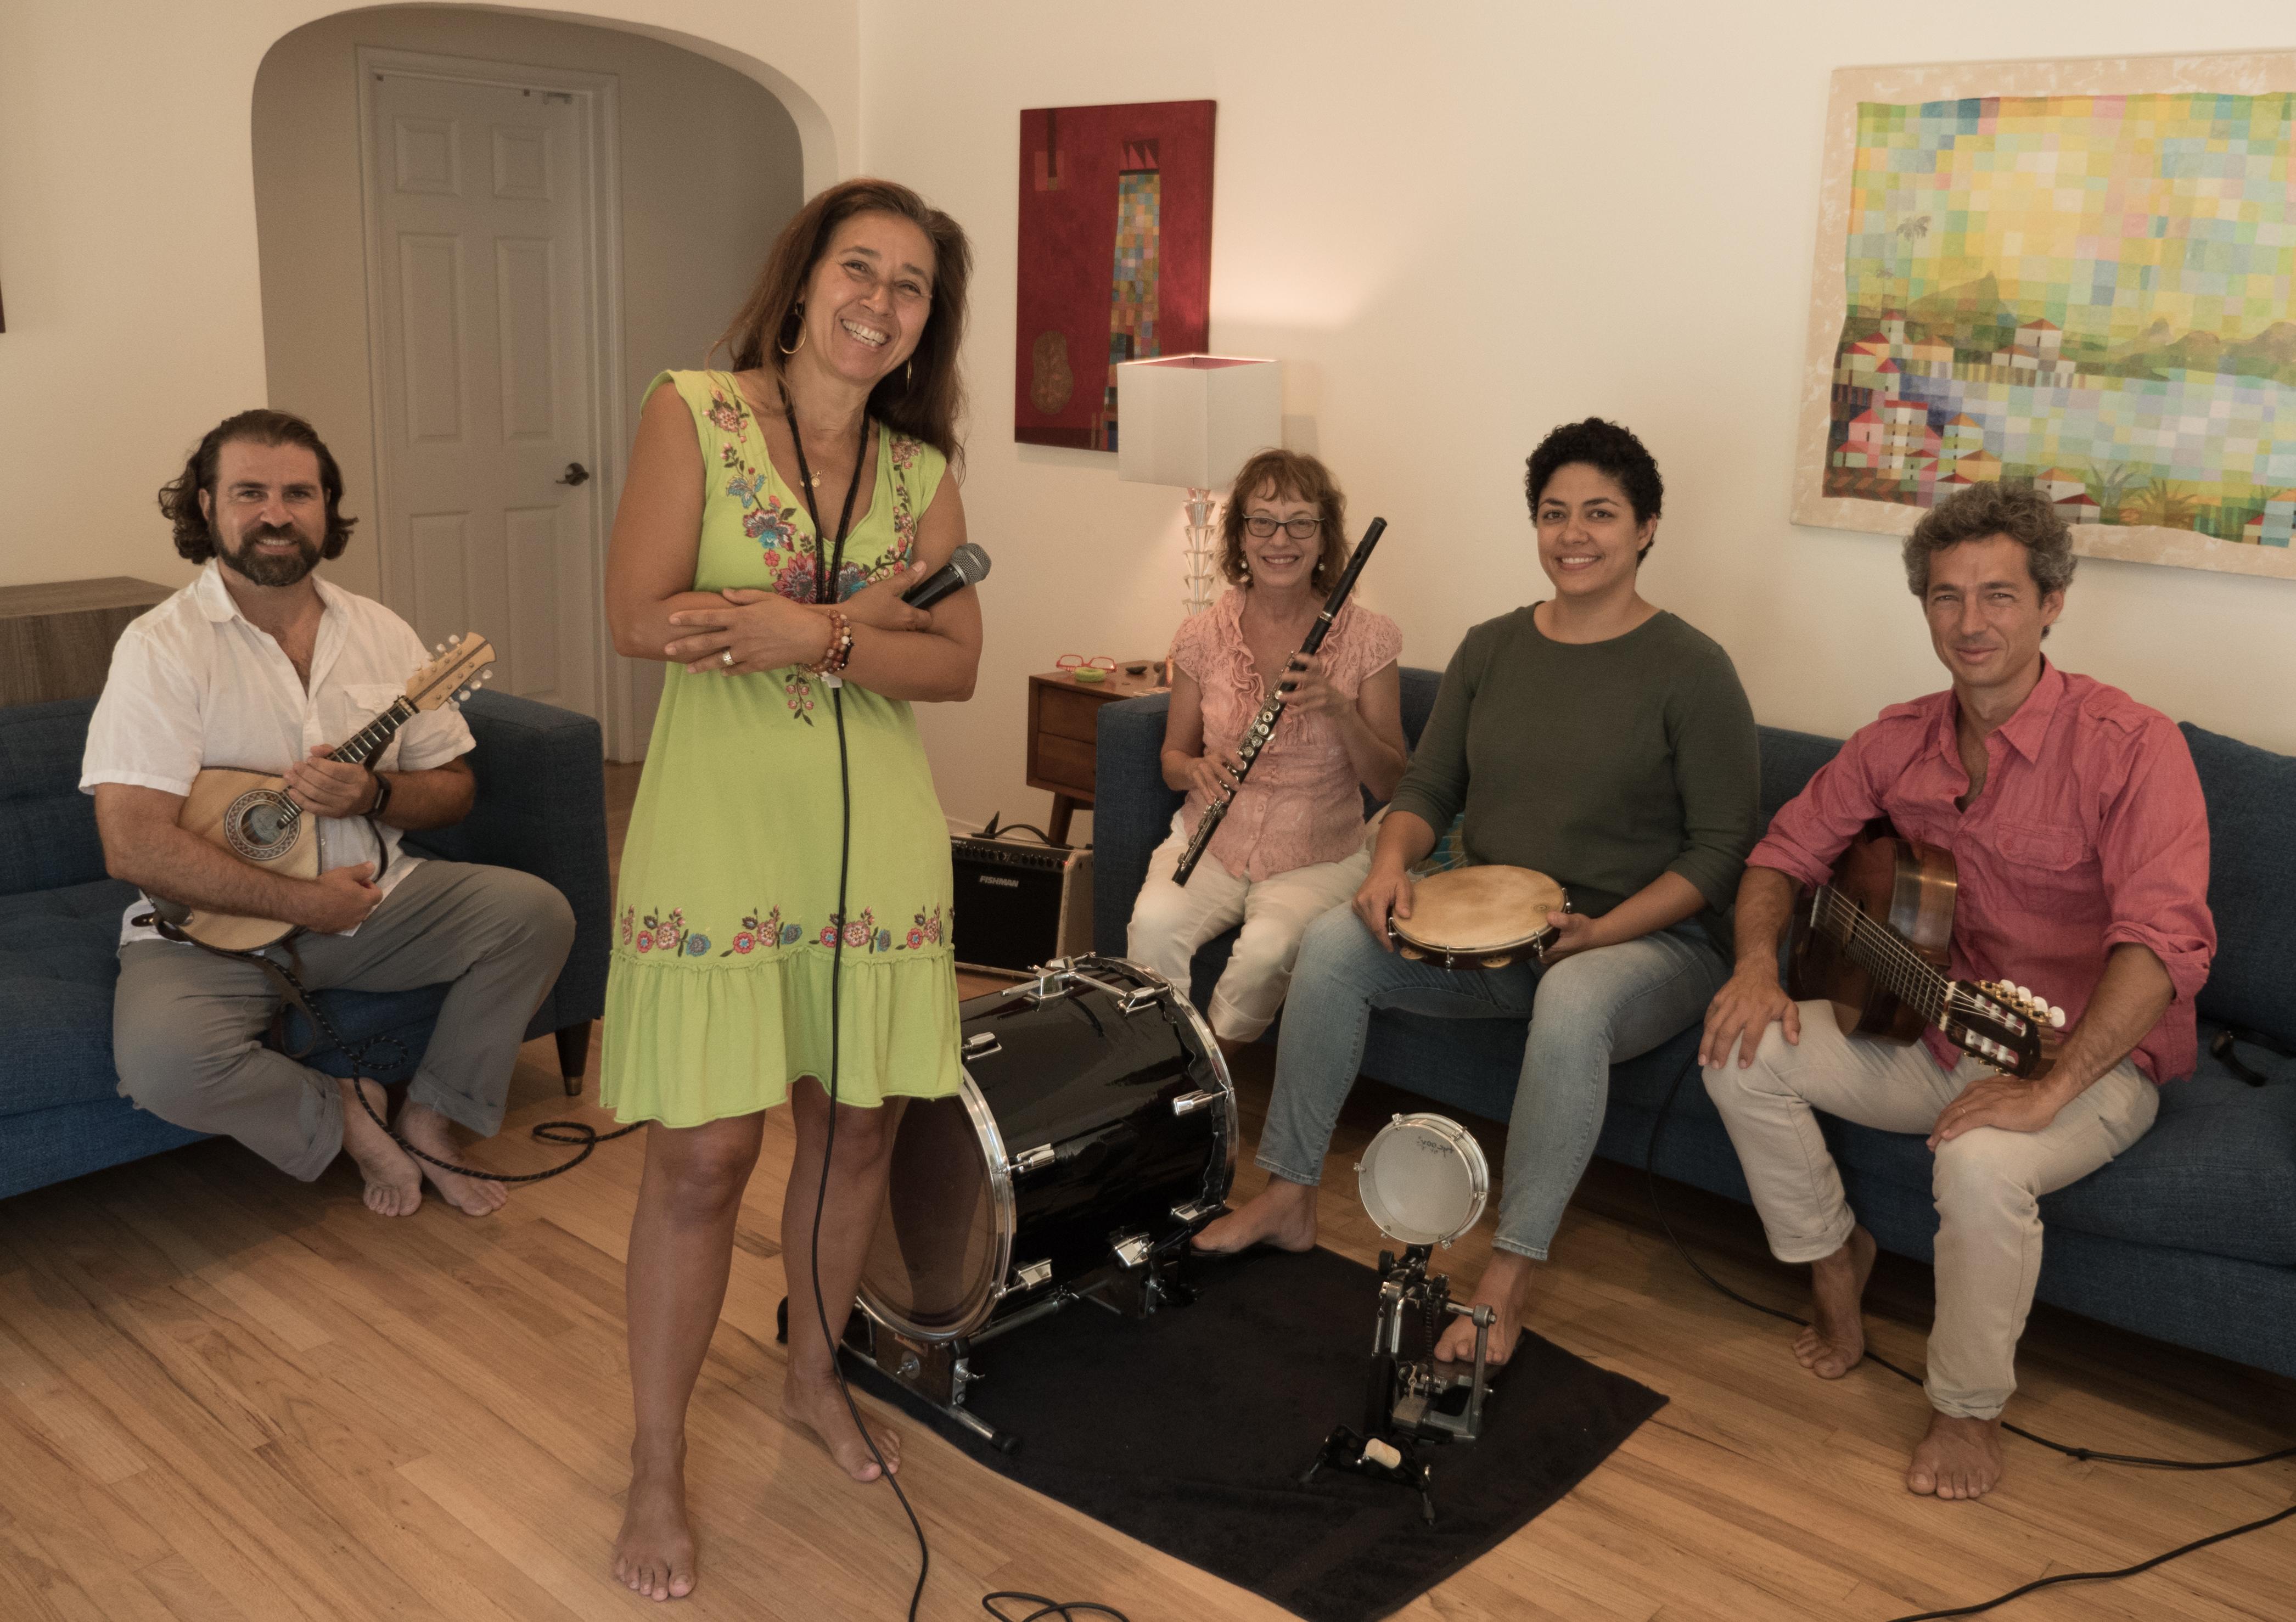 Katia Moraes & Brazilian Hearts